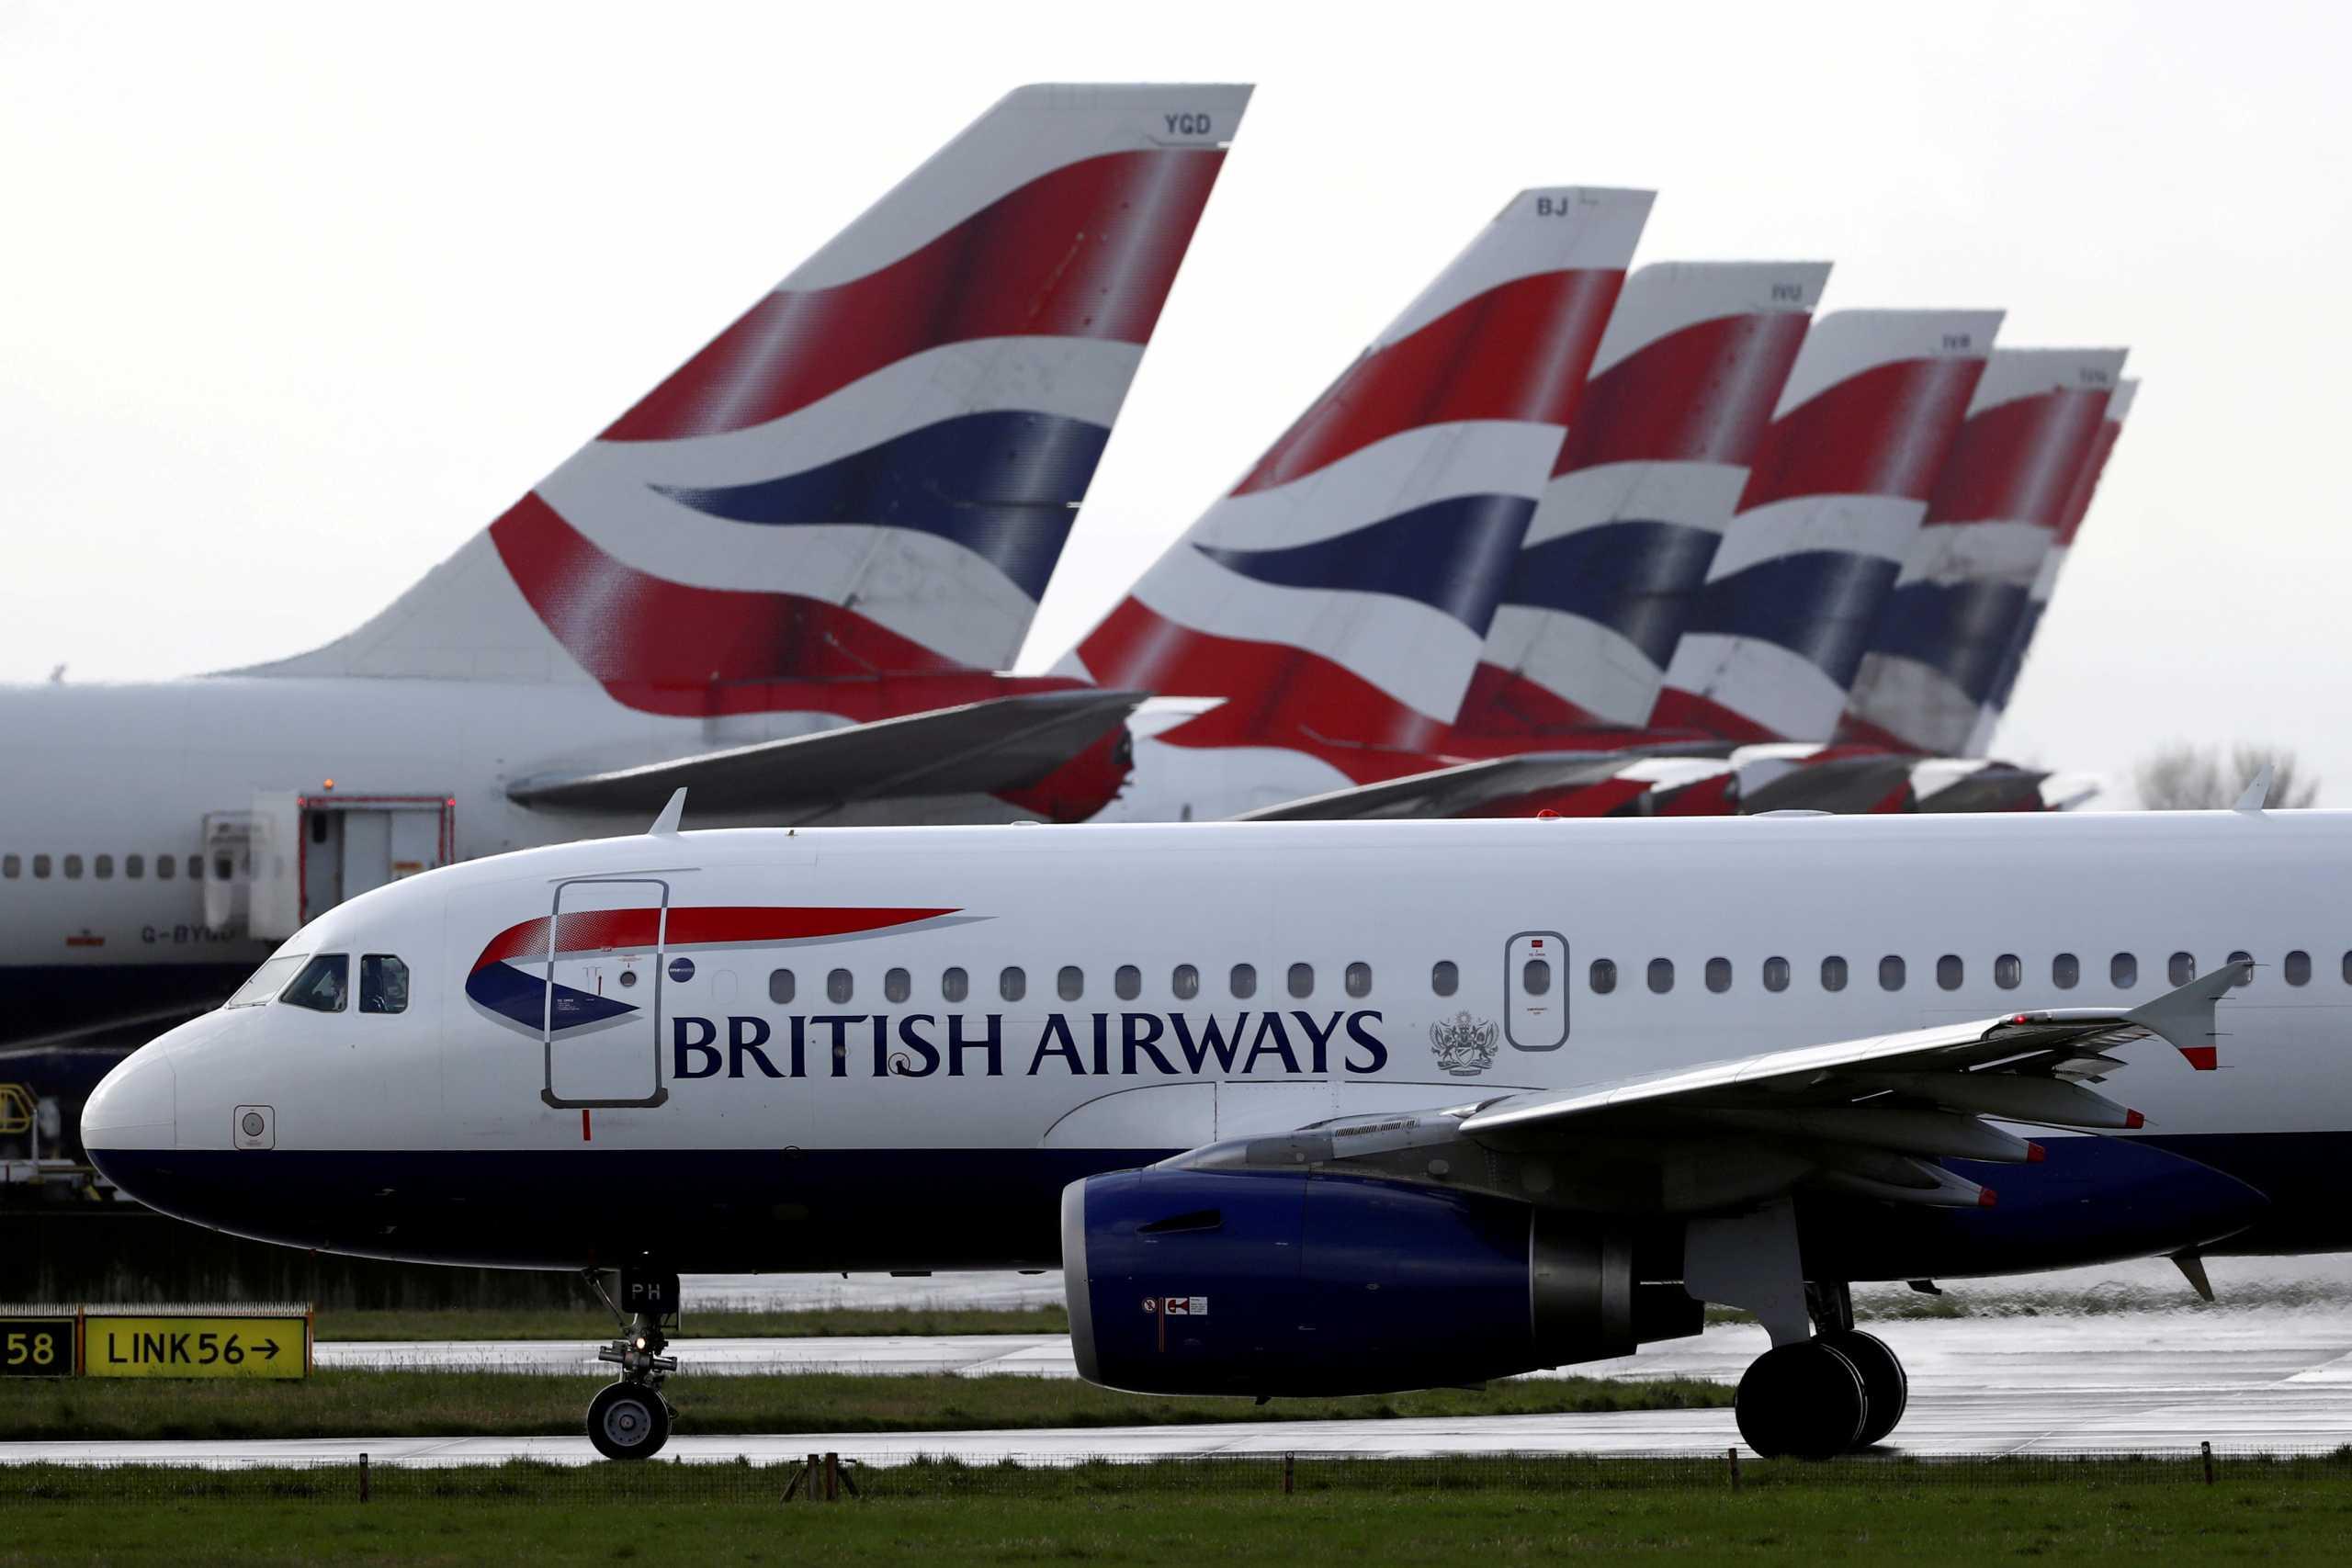 British Airways: Χωρίς περιορισμούς τα ταξίδια σε όσους έχουν εμβολιαστεί ή έχουν αρνητικό τεστ κορονοϊού